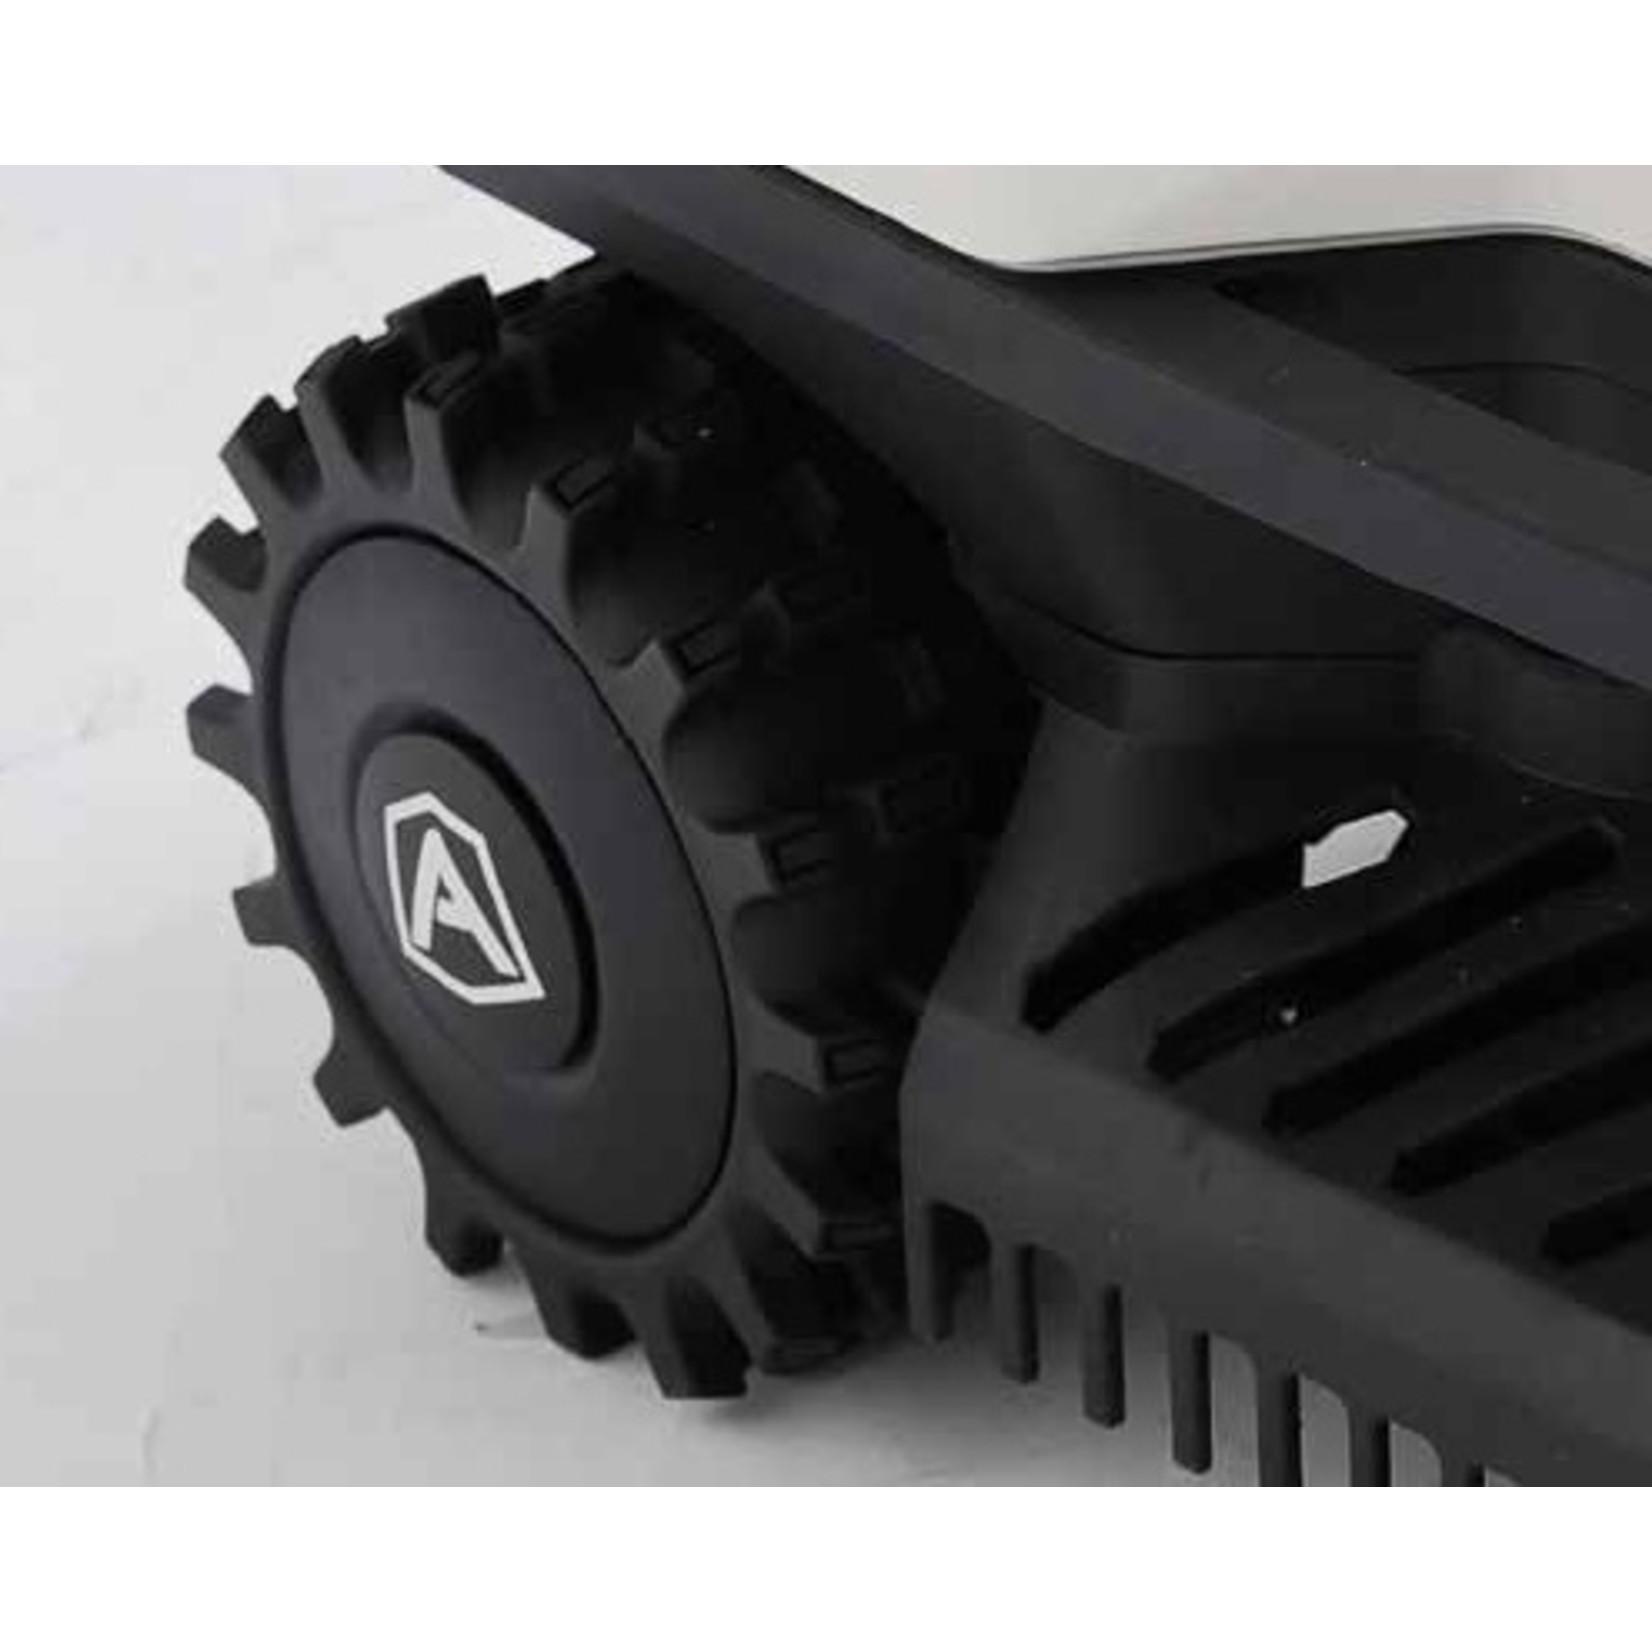 Ambrogio Ambrogio Nextline Twenty Deluxe Rasenmähroboter Modell 2021